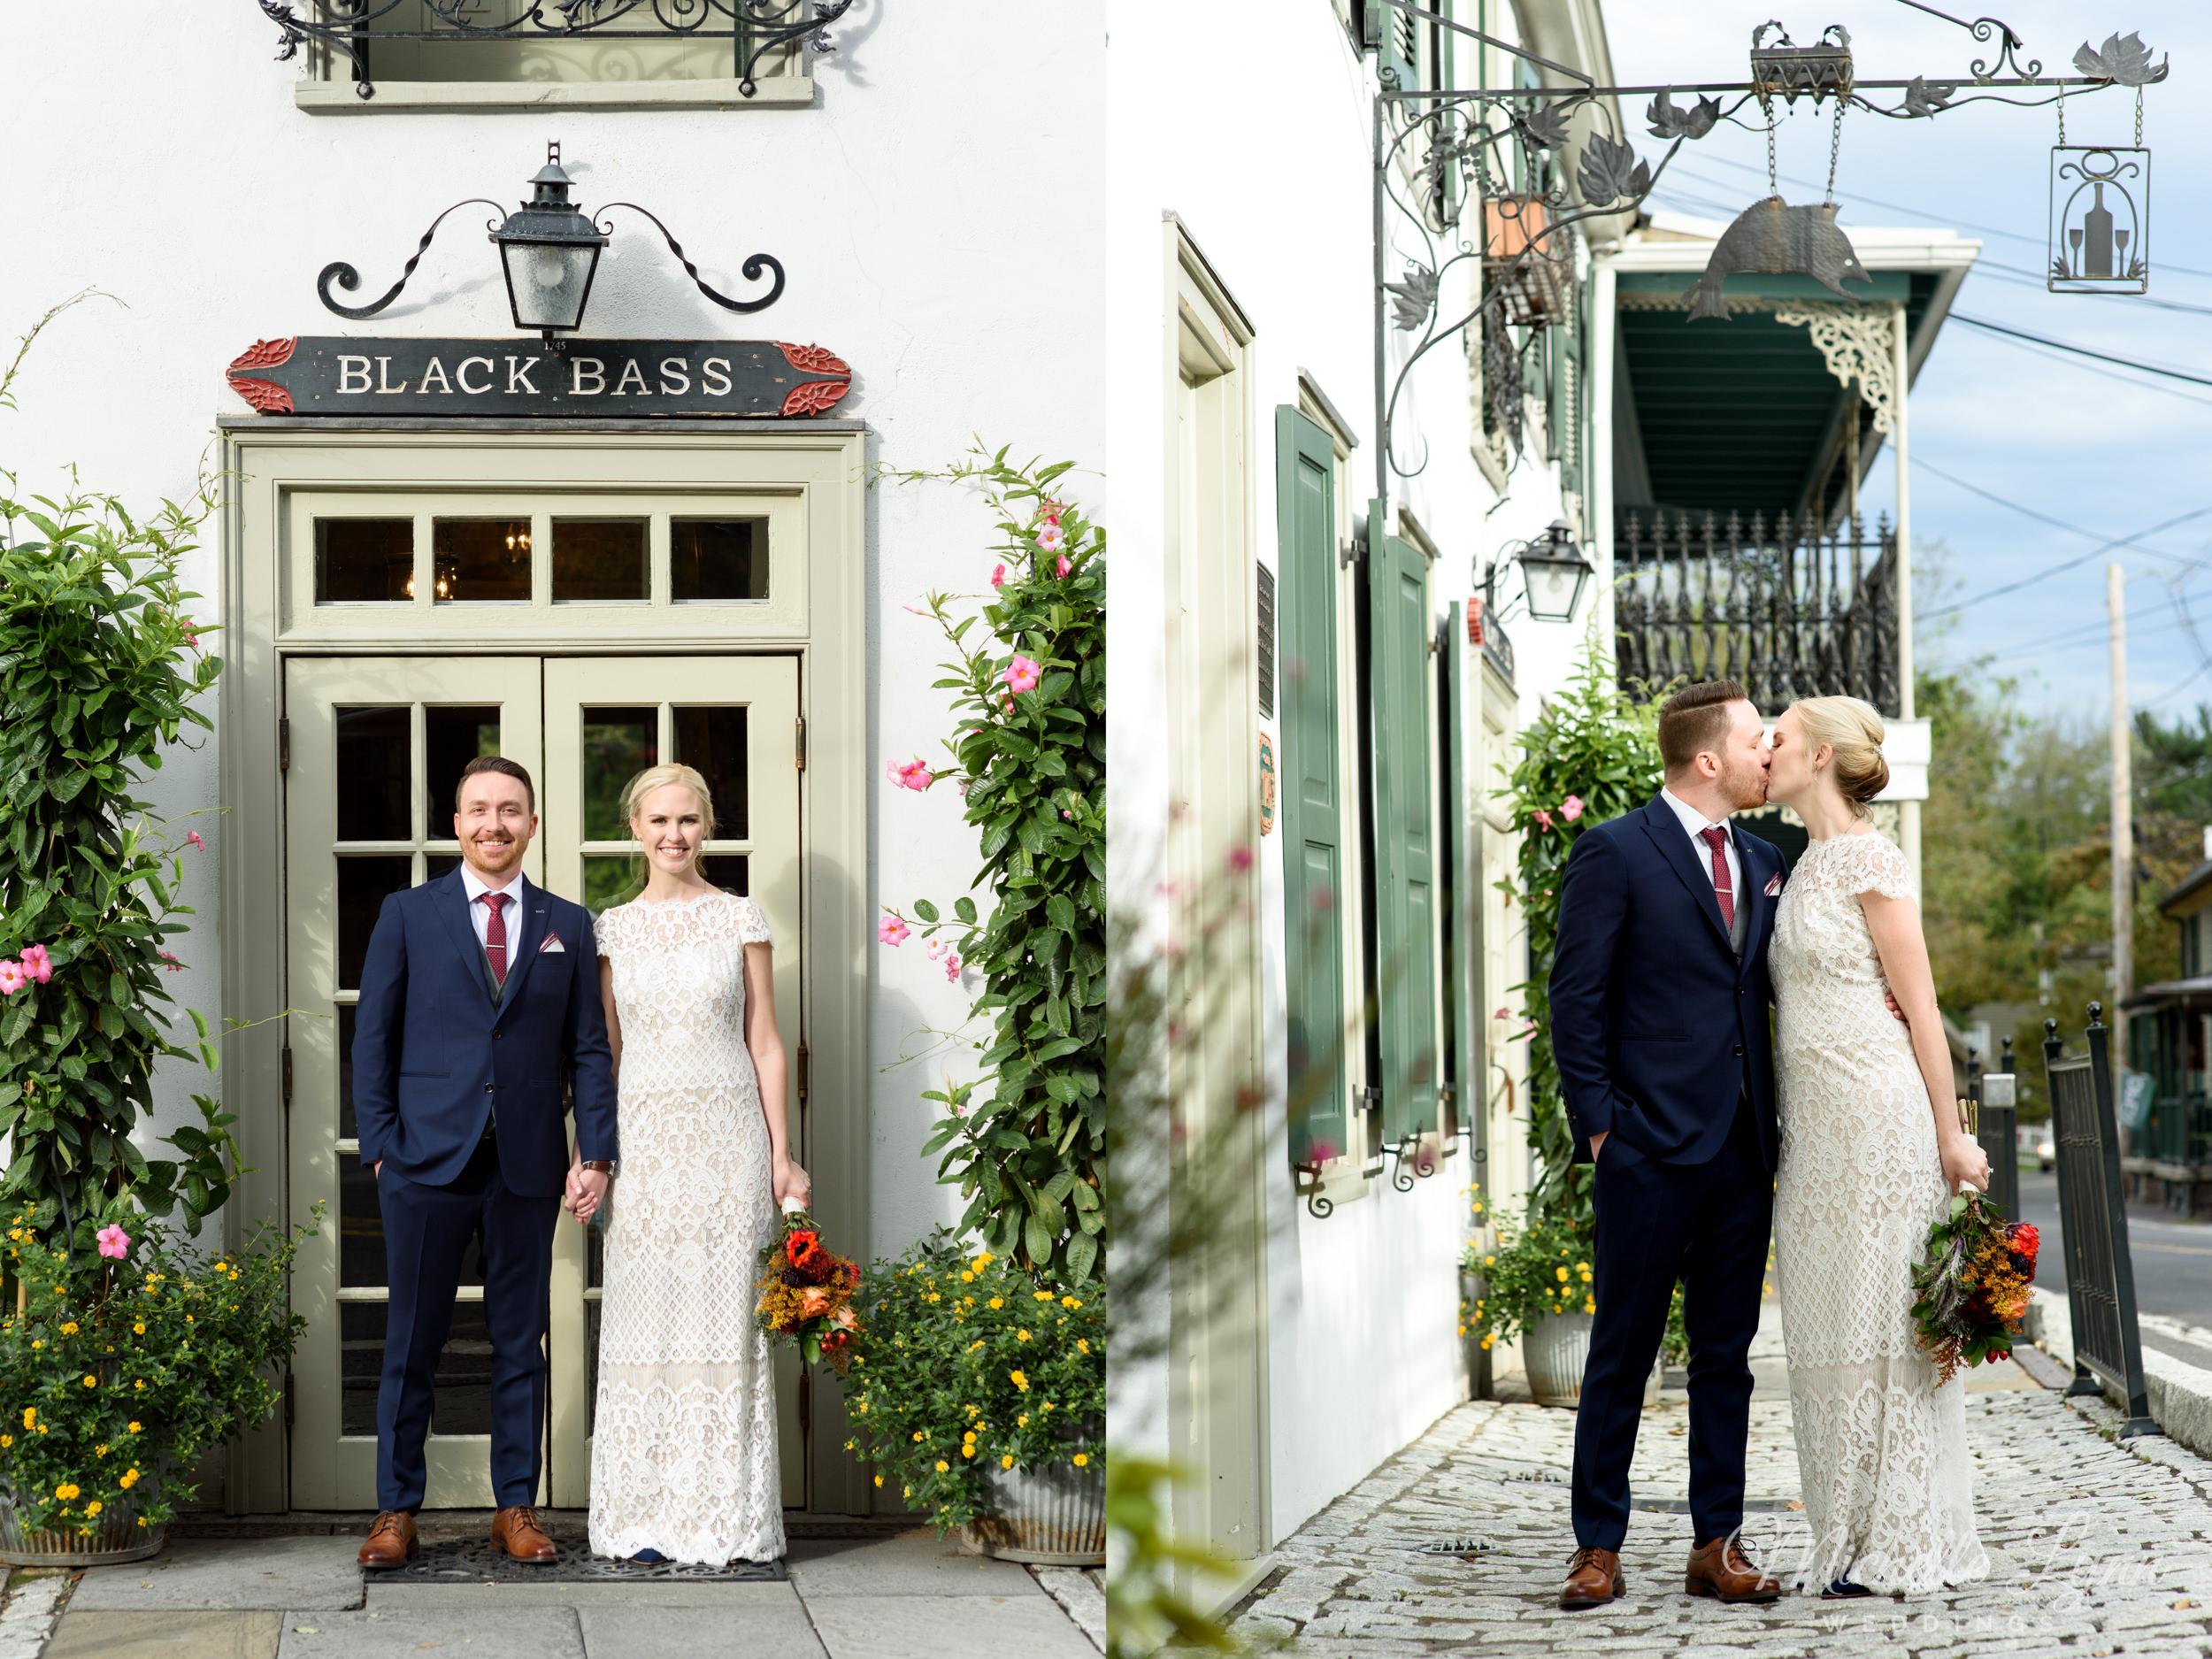 mlw-lumberville-general-store-new-hope-wedding-photographer-28.jpg